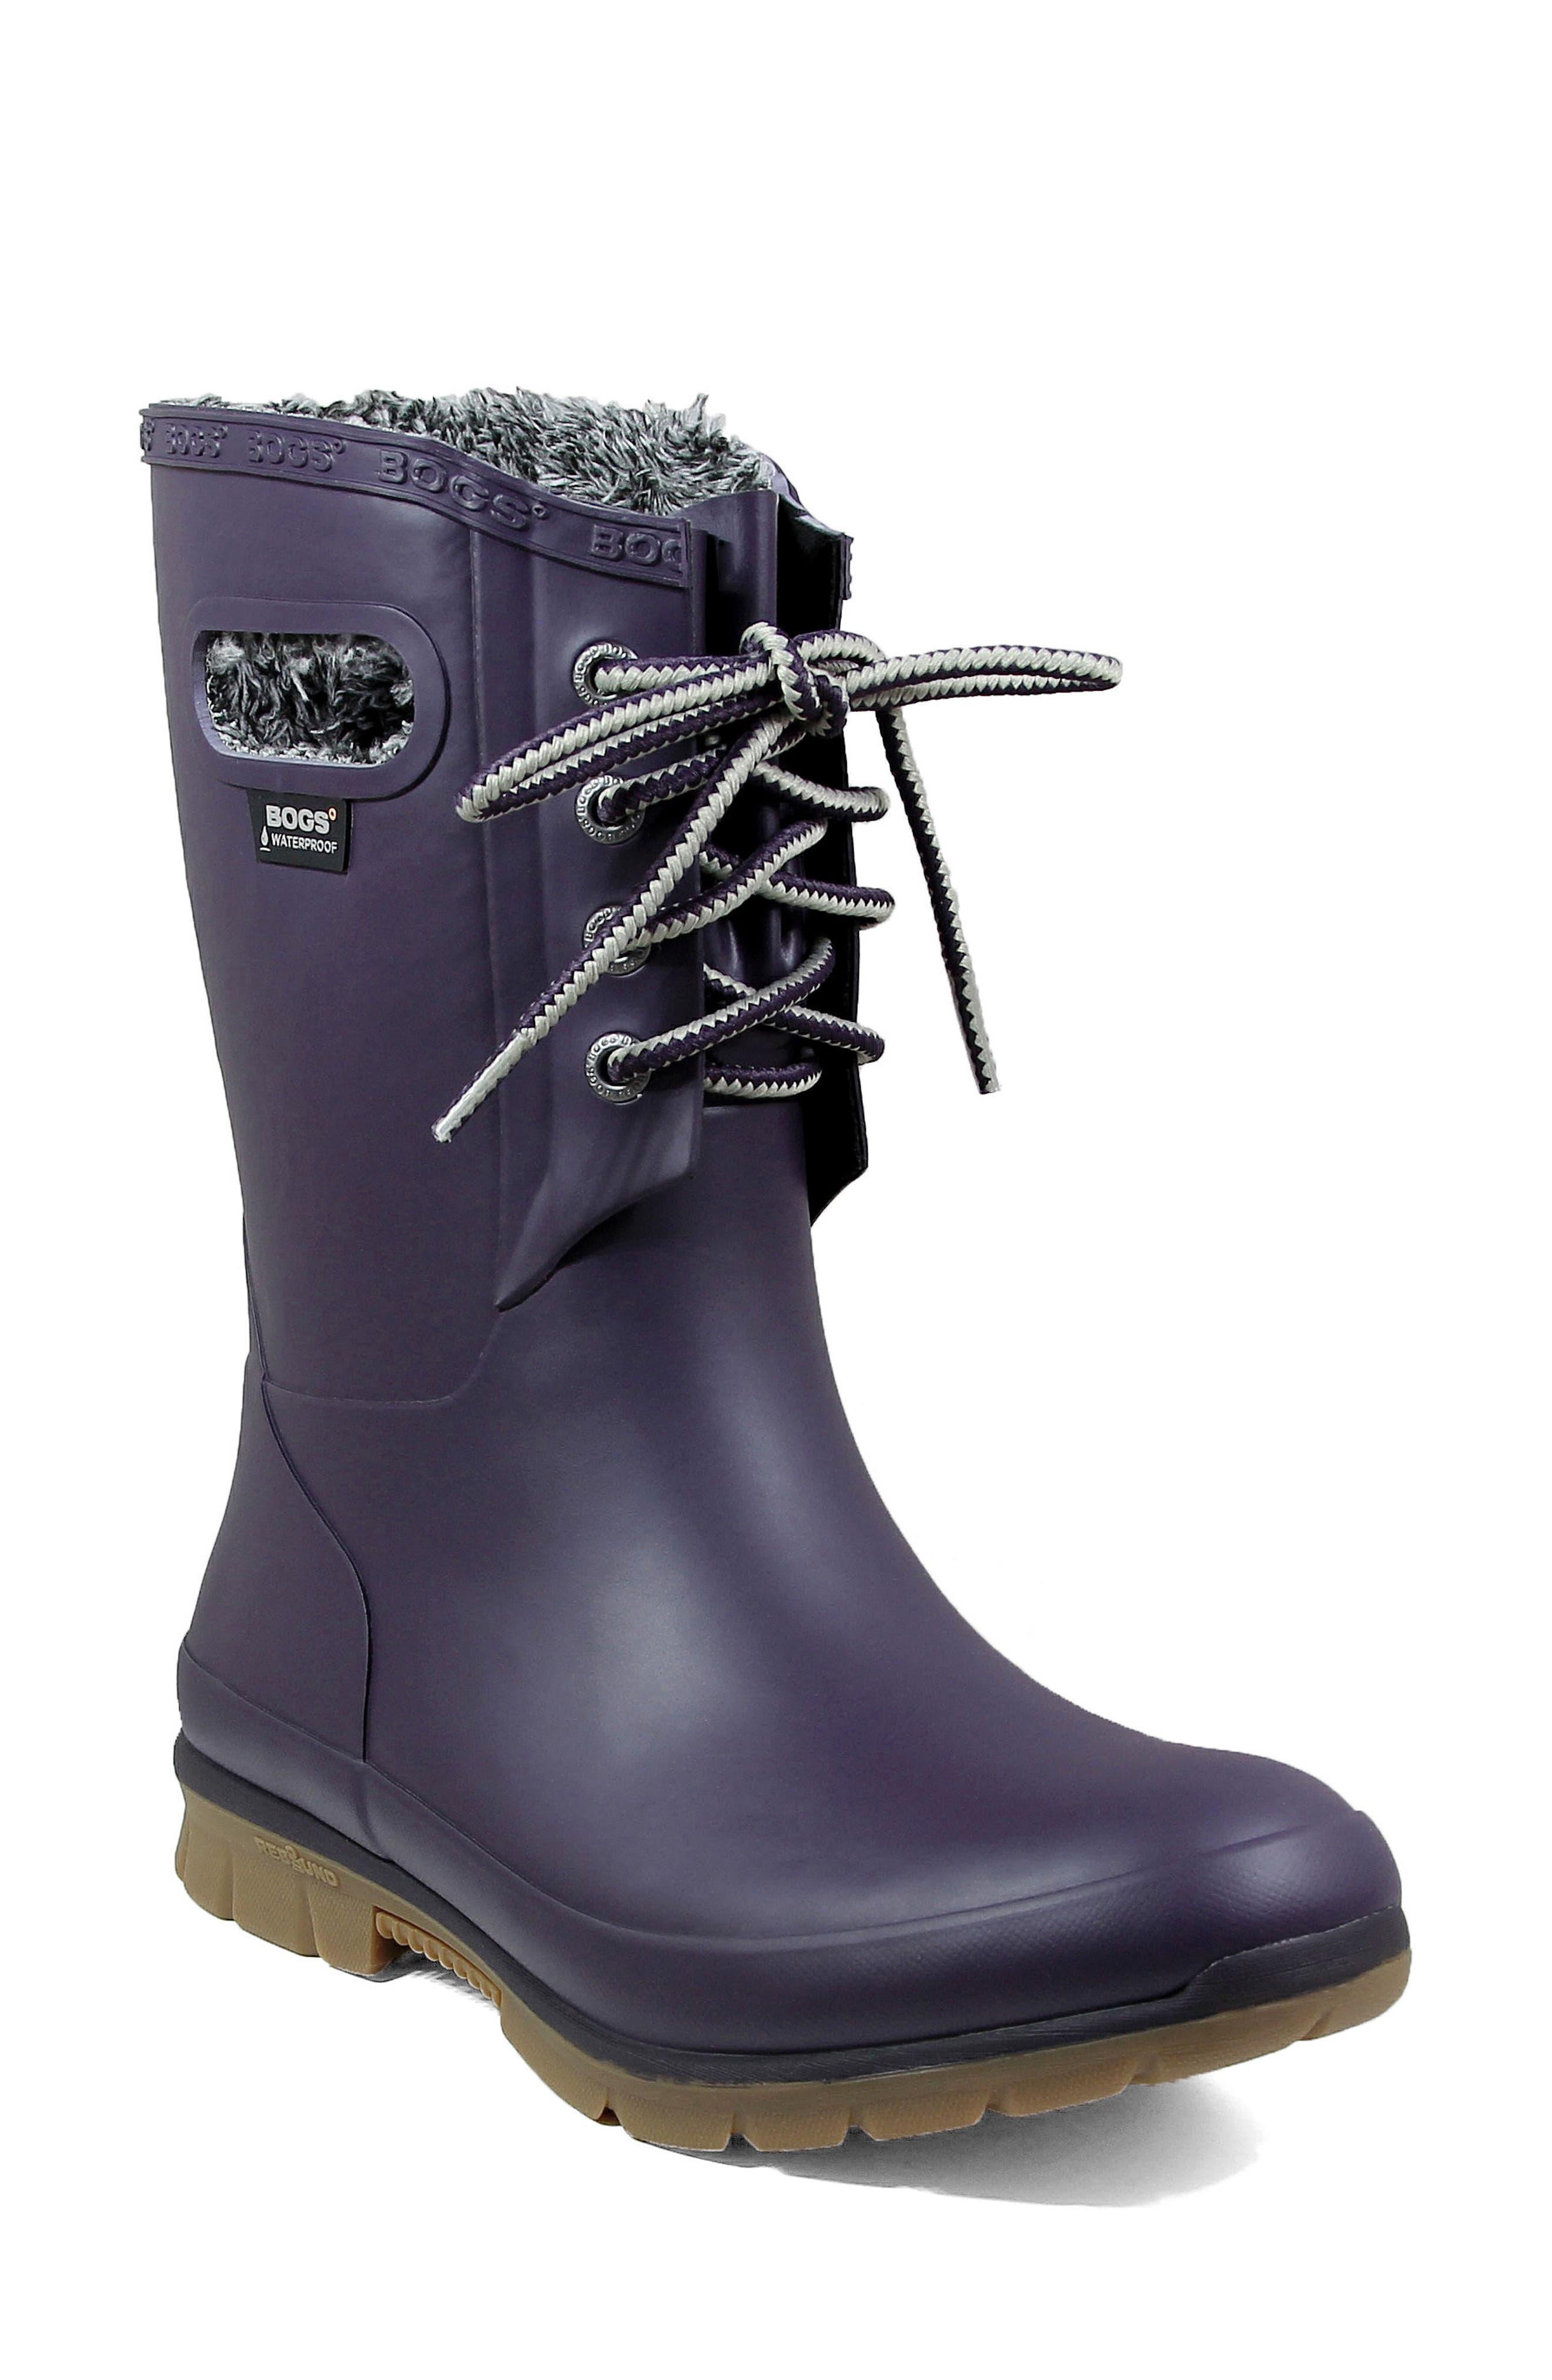 Main Image - Bogs Amanda Plush Waterproof Rain Boot (Women)